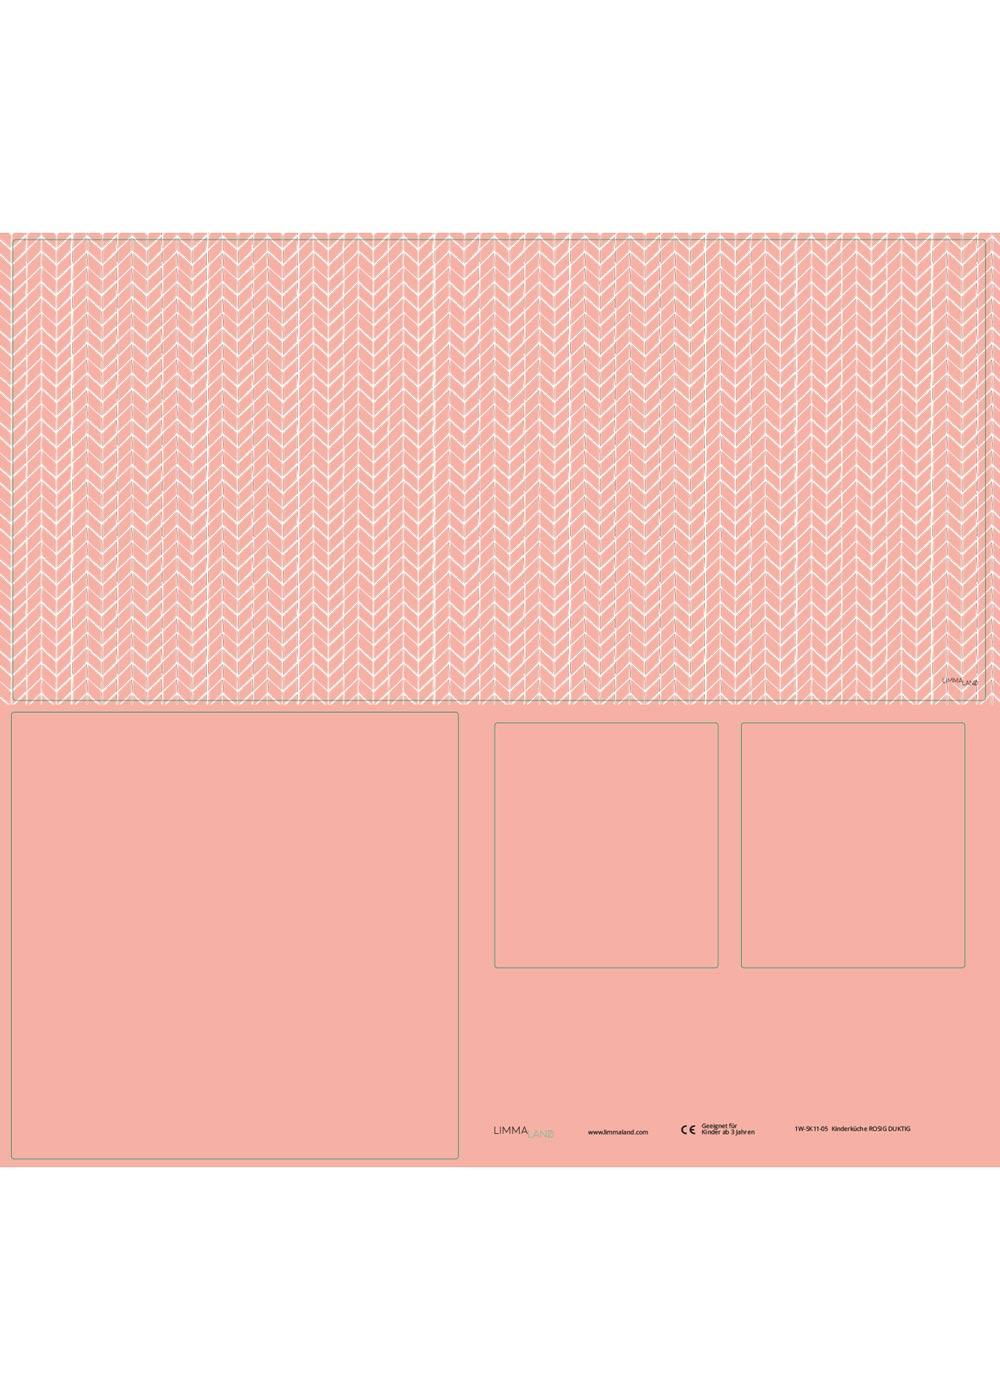 Ikea Duktig Kinderküche Rosig Rosa  Druckvorlage